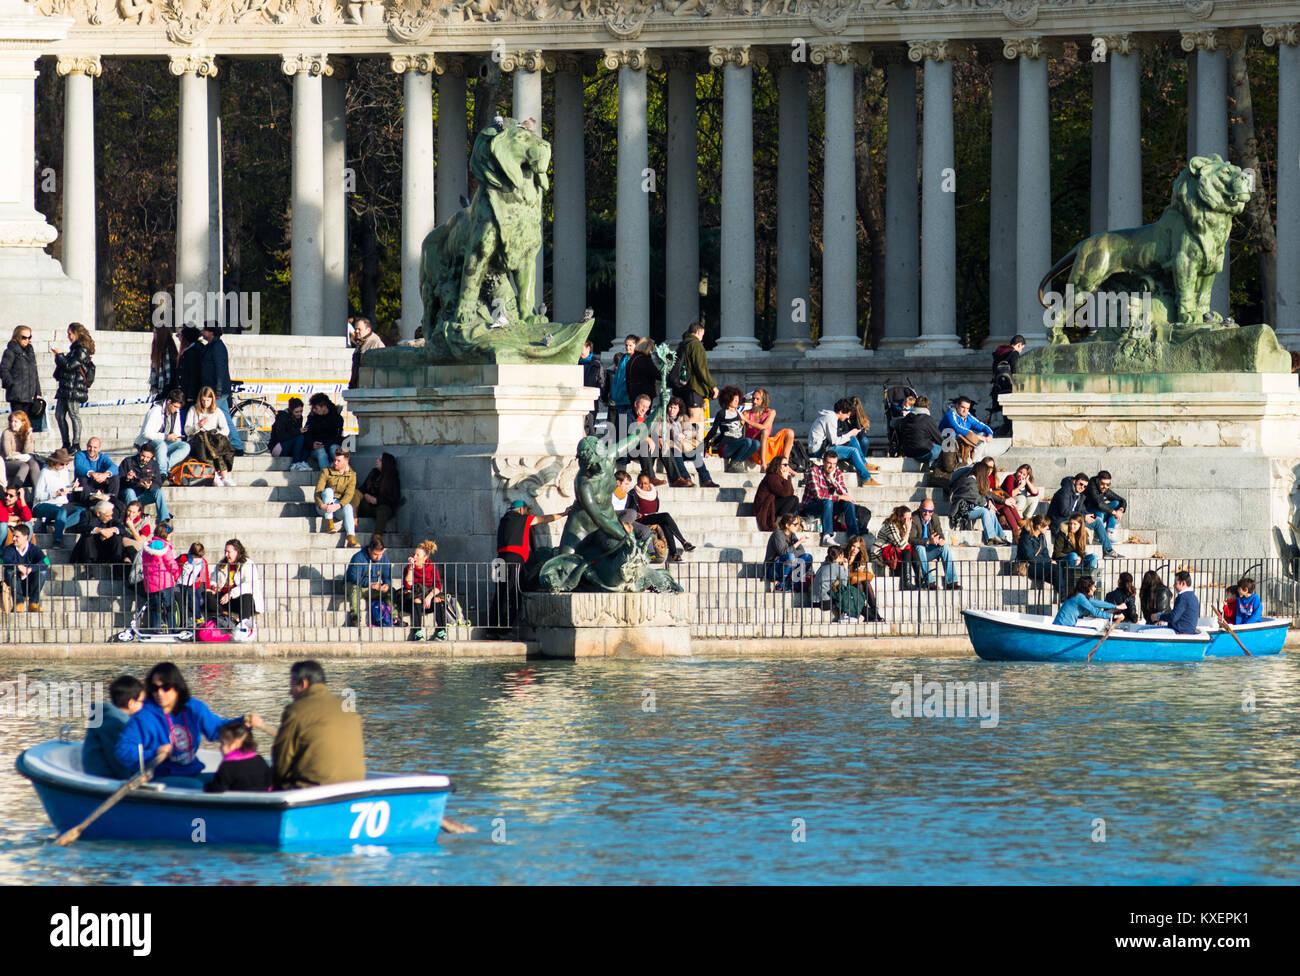 Boating on the main lake in Beun Retiro park, Madrid, Spain. - Stock Image